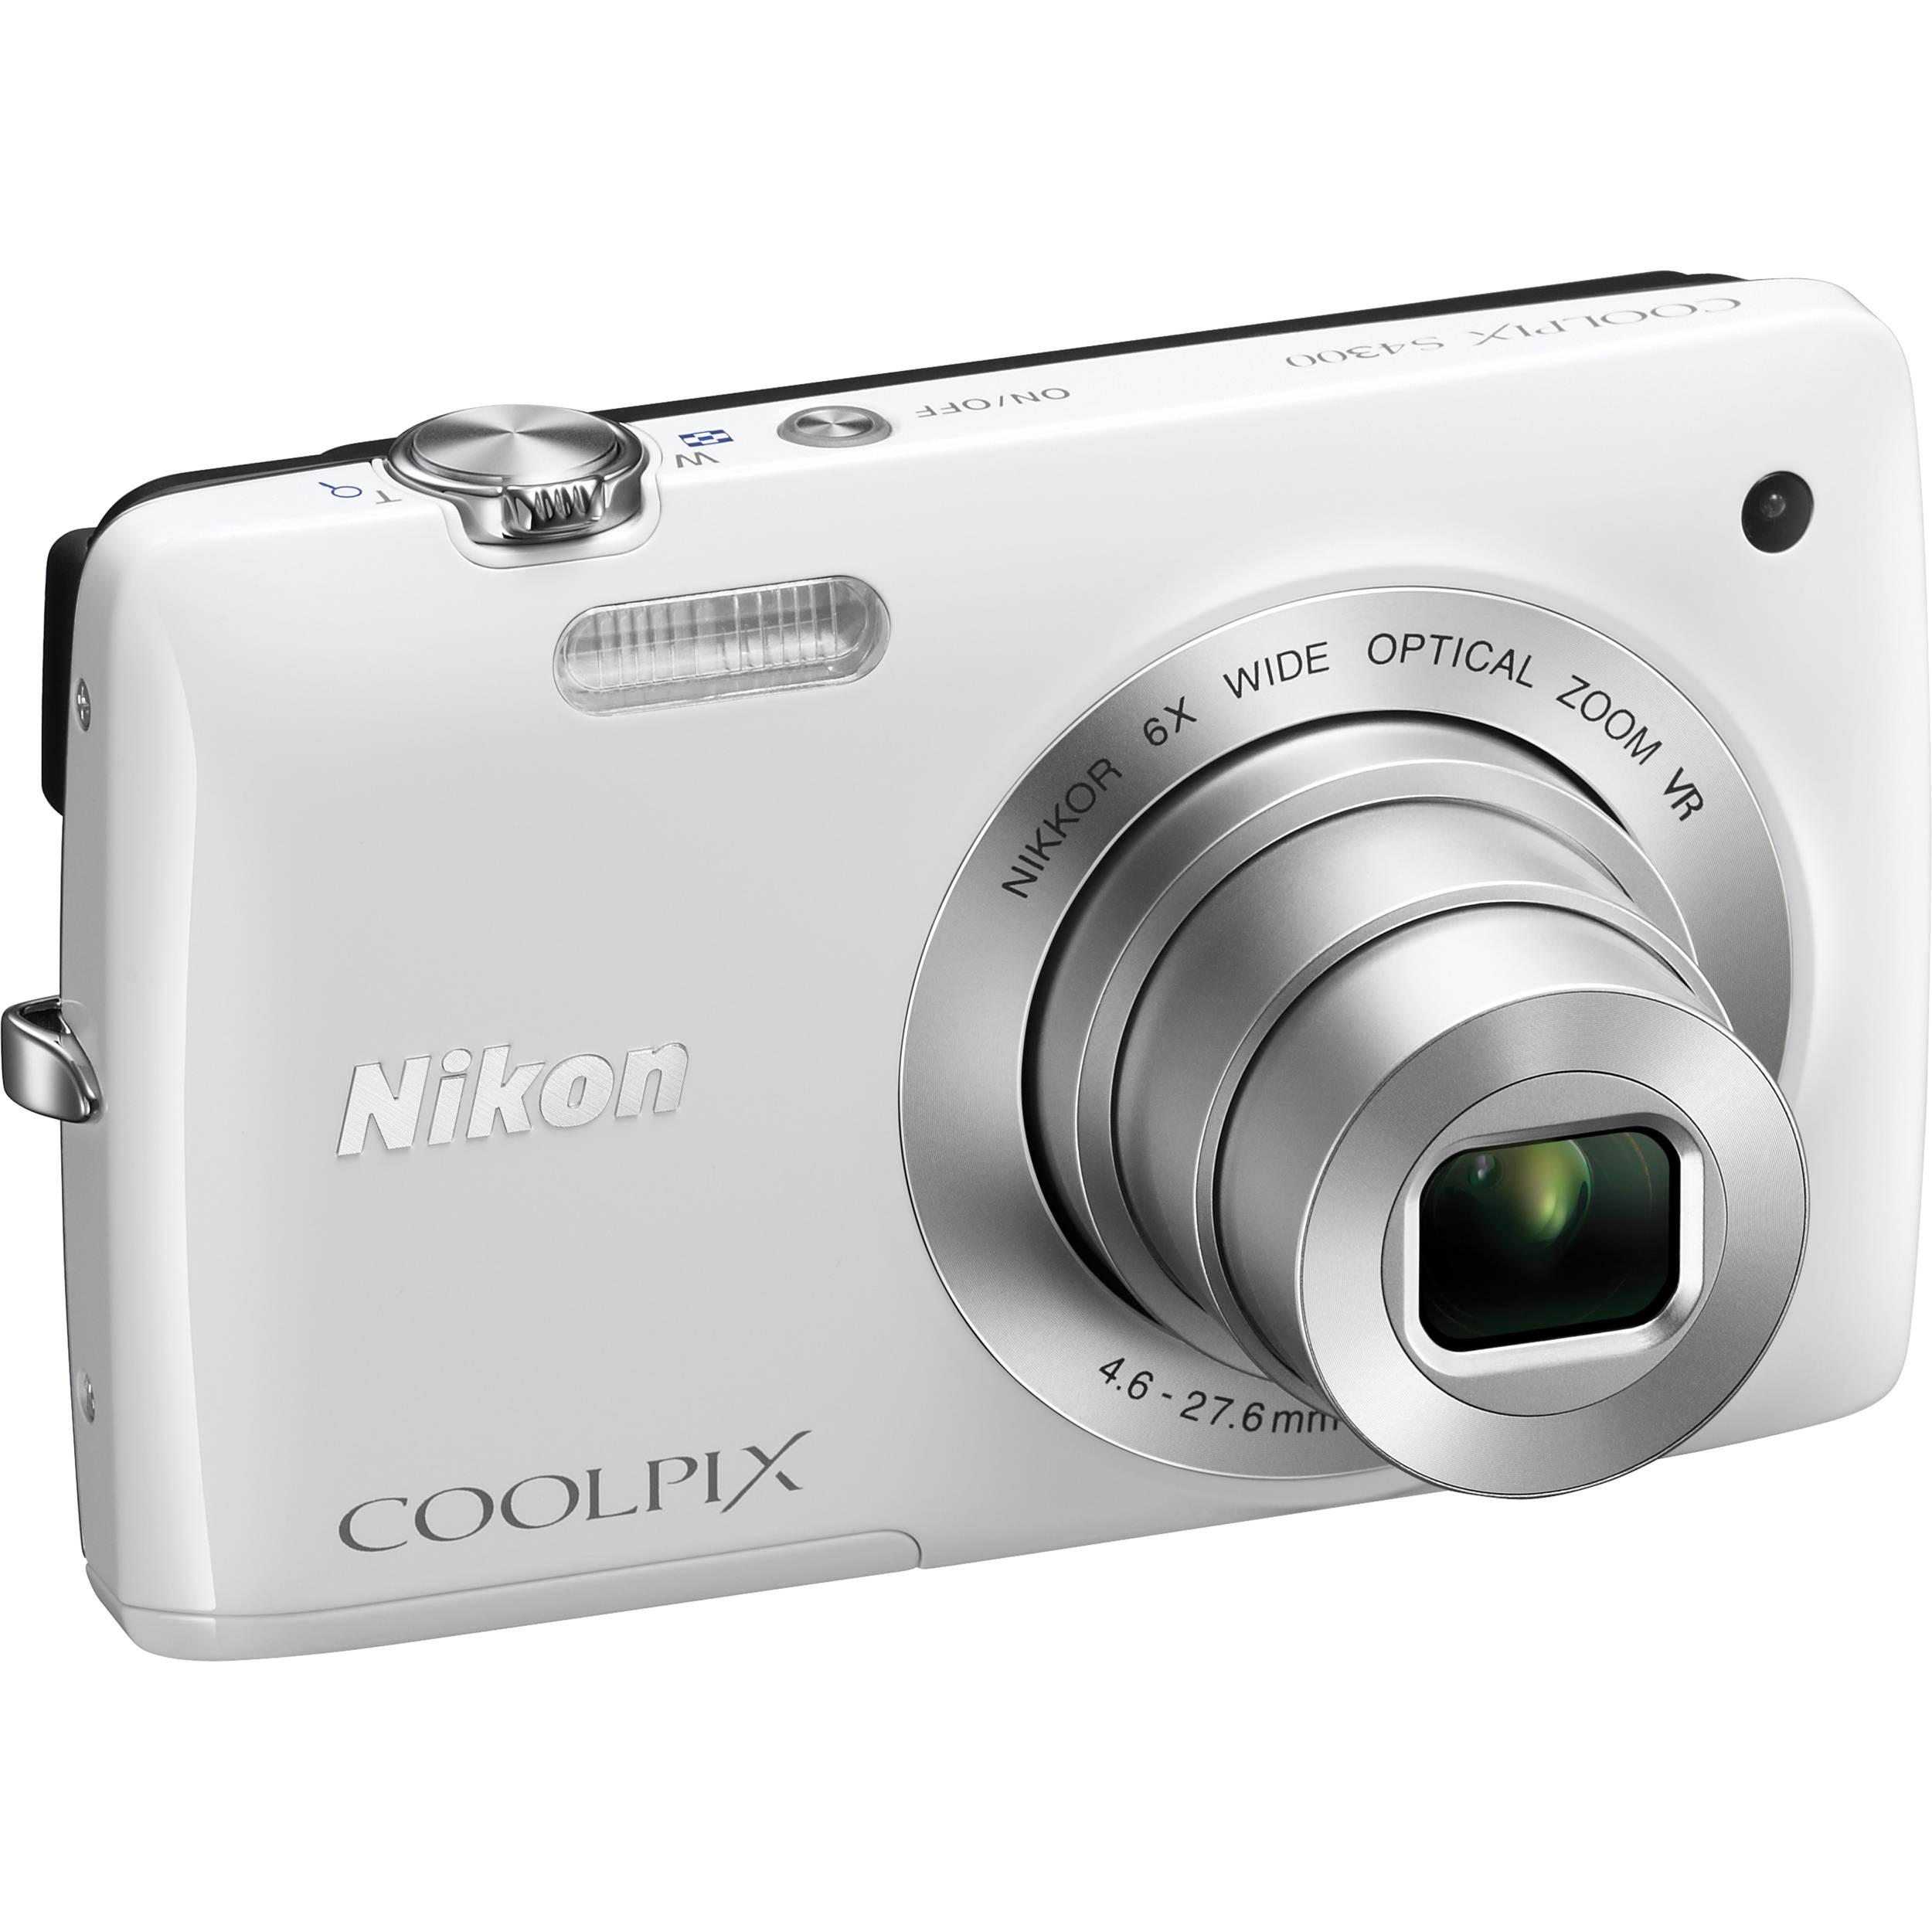 nikon coolpix s4300 digital camera white 26307 b h photo video rh bhphotovideo com Nikon Coolpix S3700 Nikon Coolpix S6200